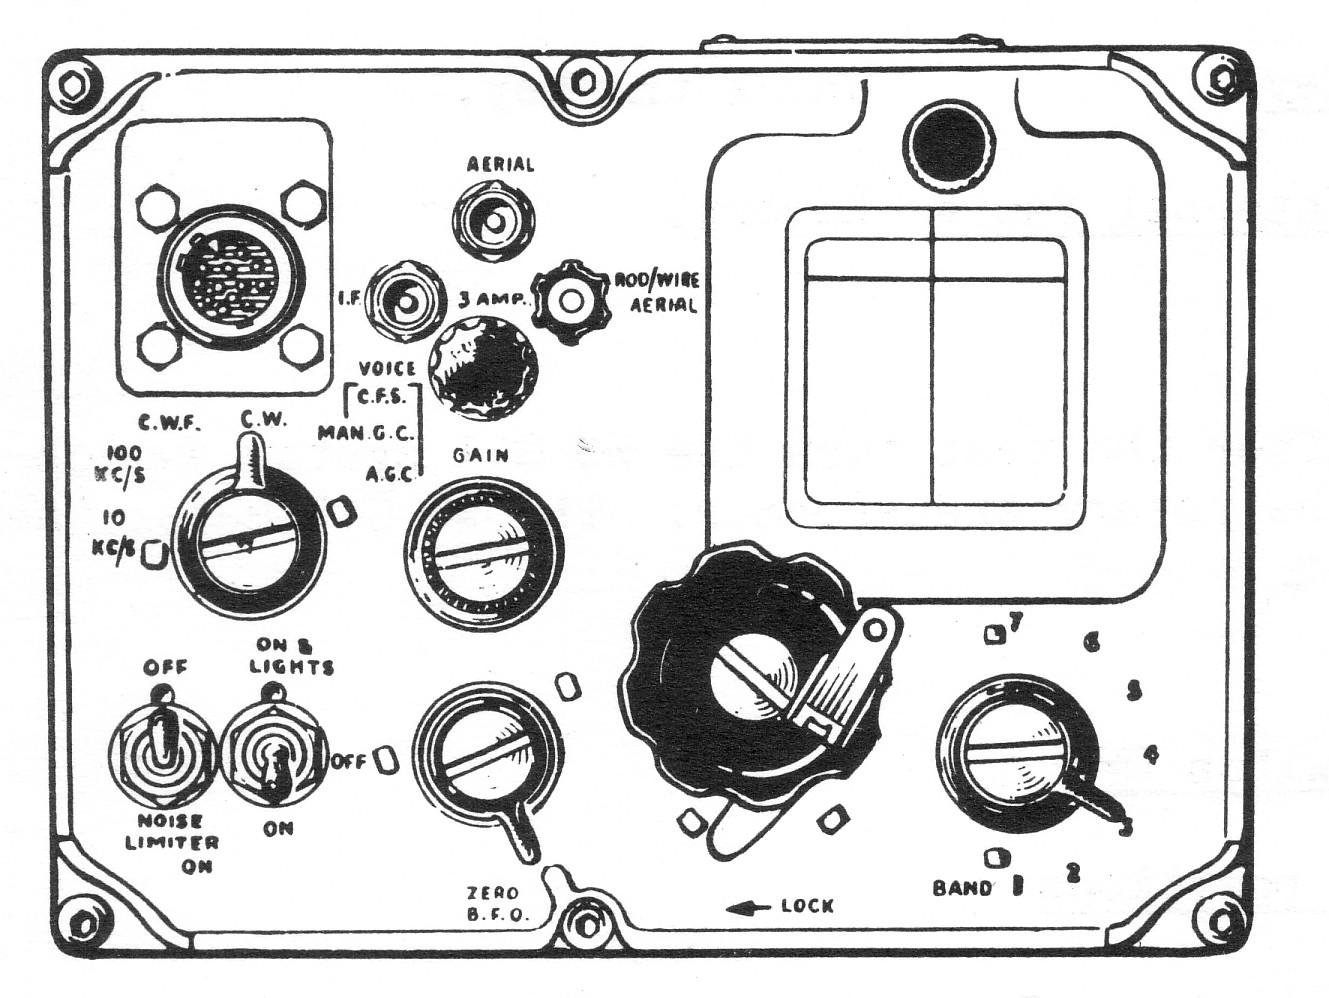 Industrial Radio Shoulder Harness